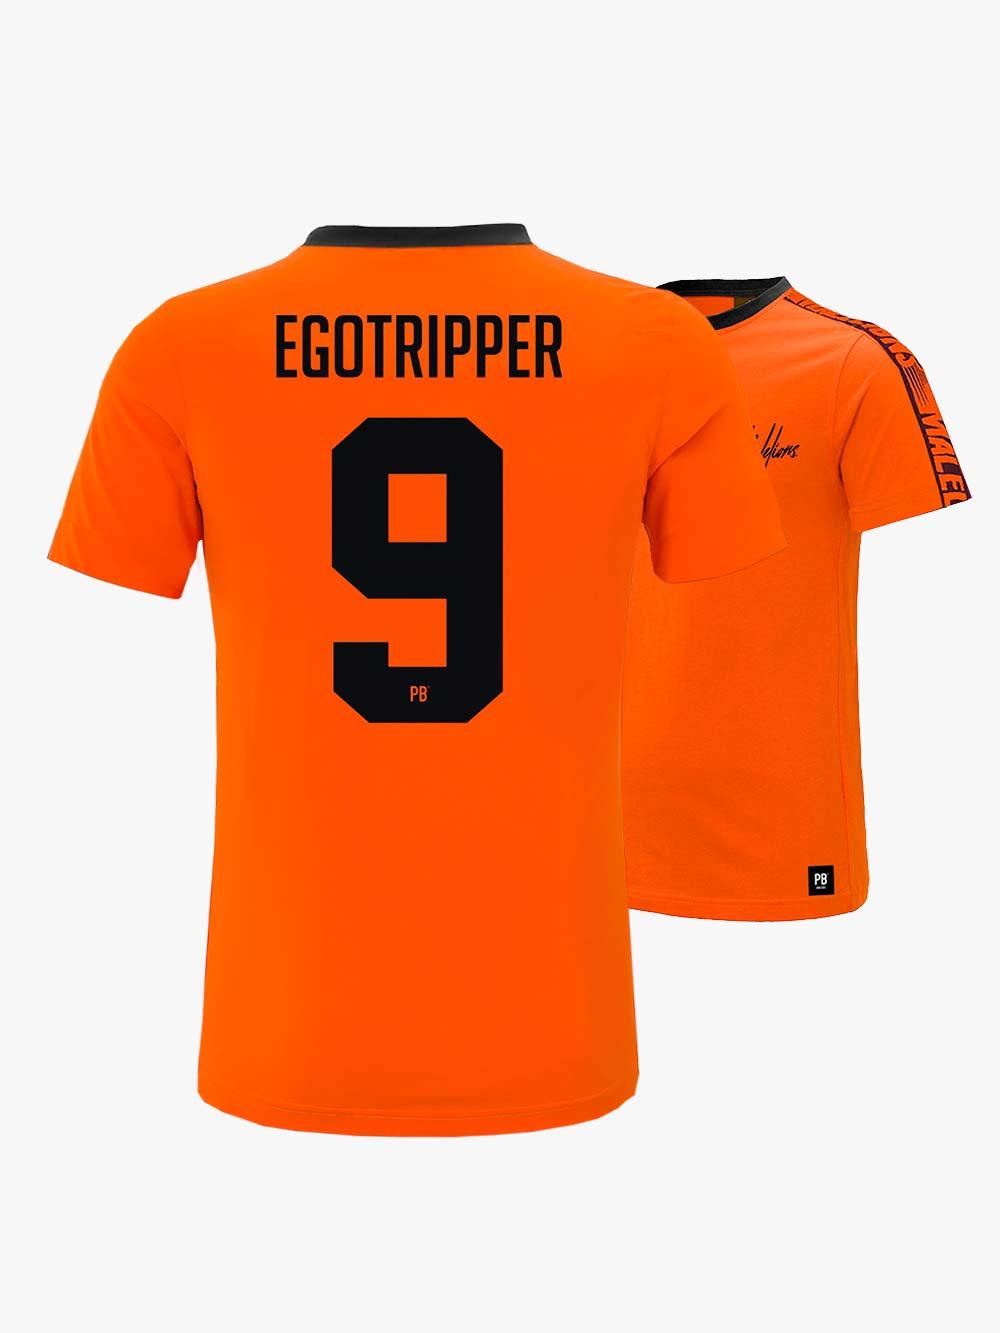 Malelions-9-egotripper-EK2021-shirt